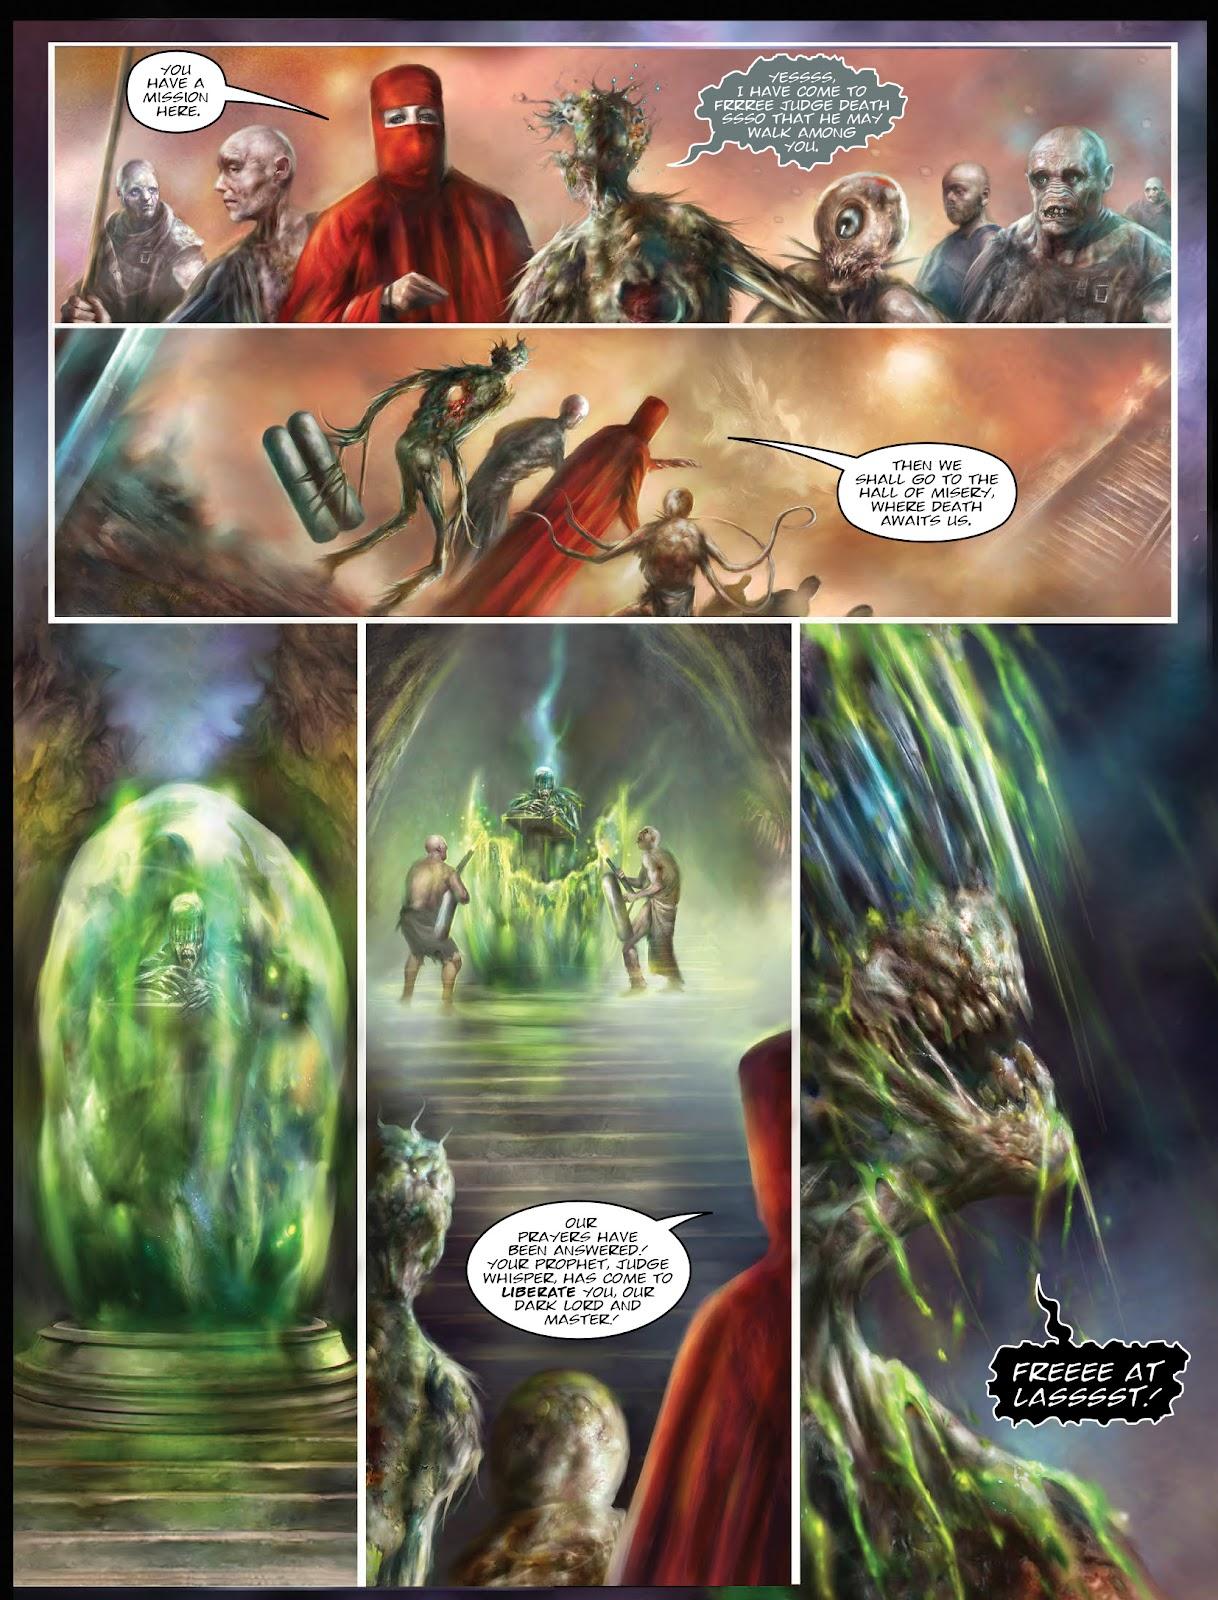 Judge Dredd Megazine (Vol. 5) issue 427 - Page 54